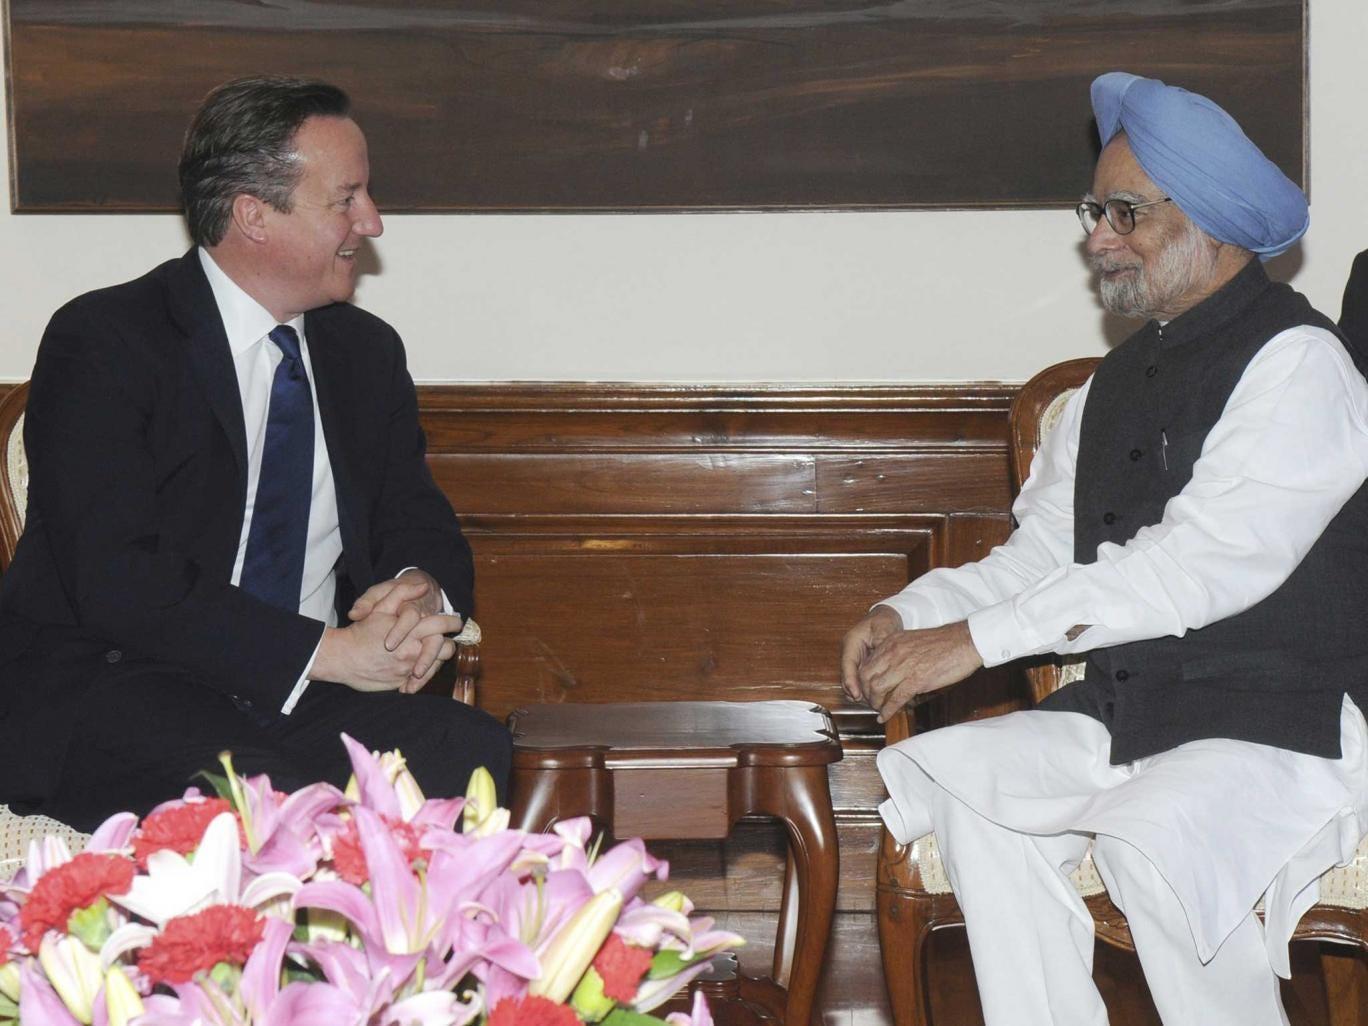 David Cameron speaks with India's Prime Minister Manmohan Singh in New Delhi